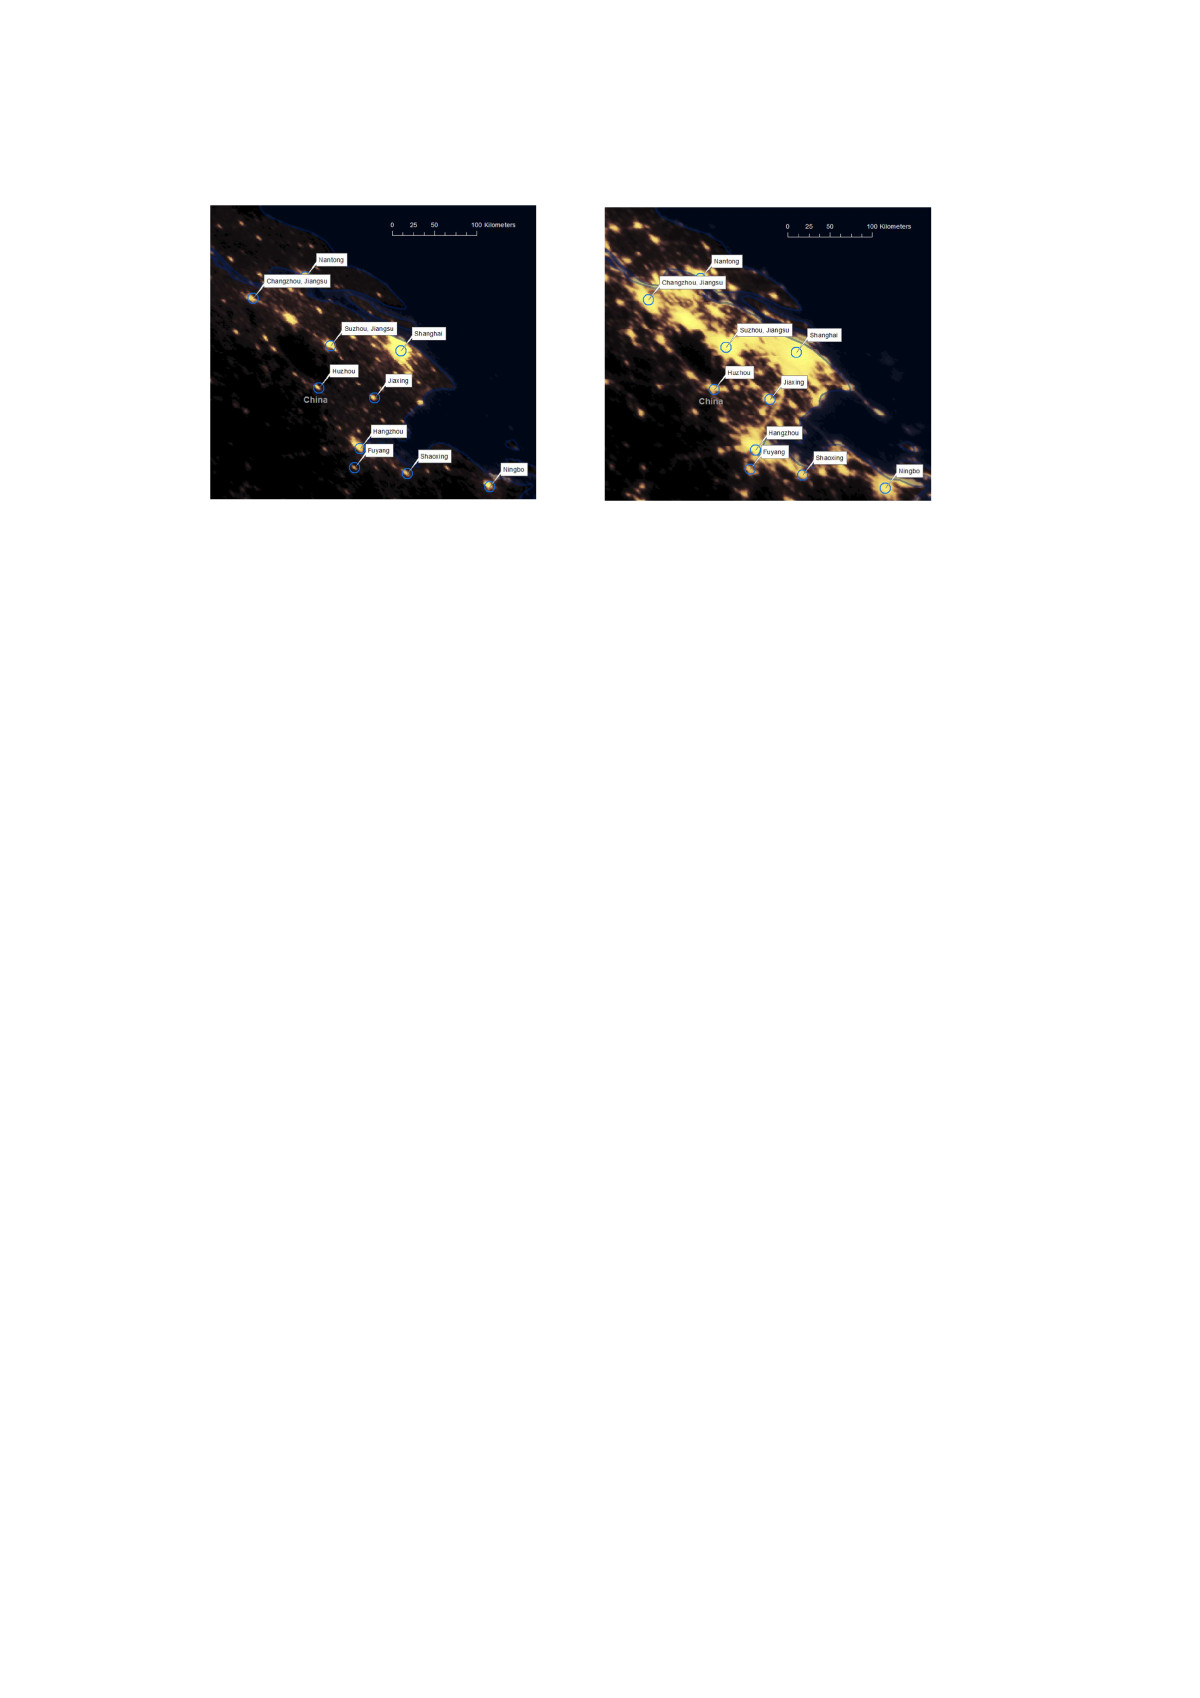 https://static-content.springer.com/image/art%3A10.1140%2Fepjds19/MediaObjects/13688_2013_Article_23_Fig14_HTML.jpg